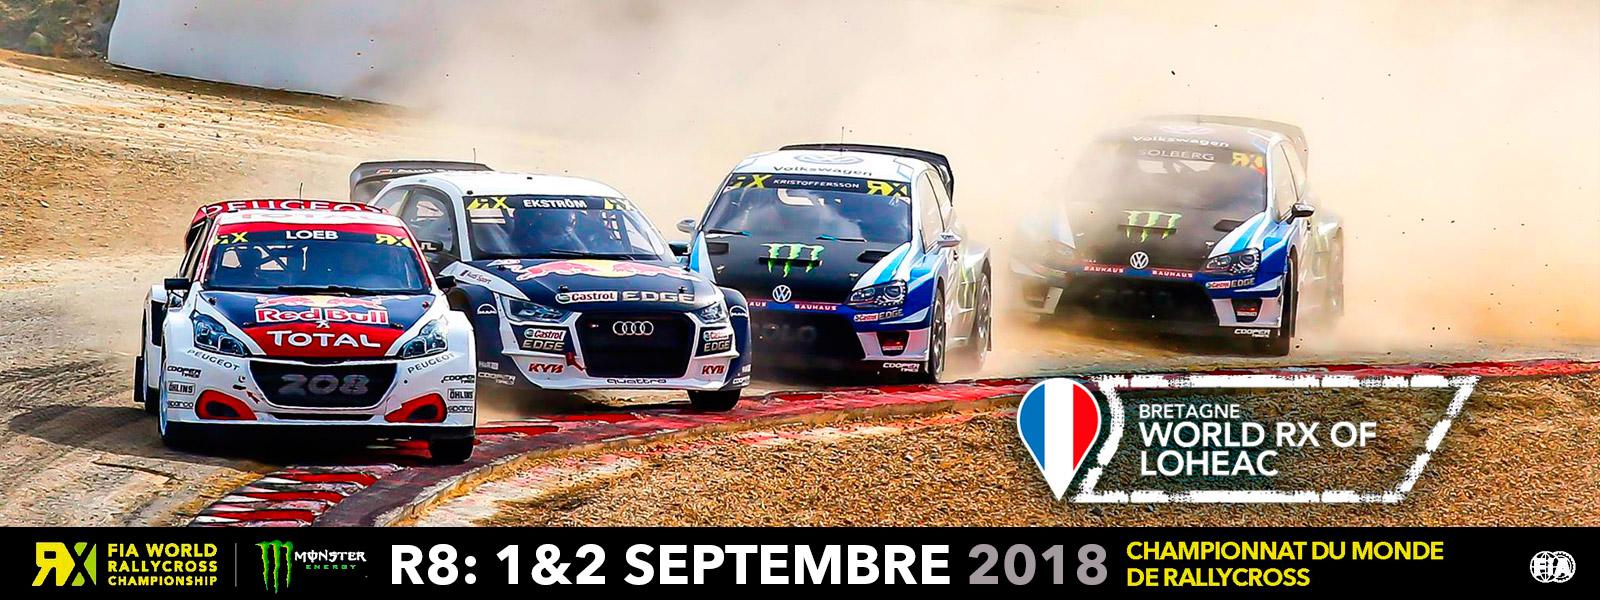 rallycross de lohéac france